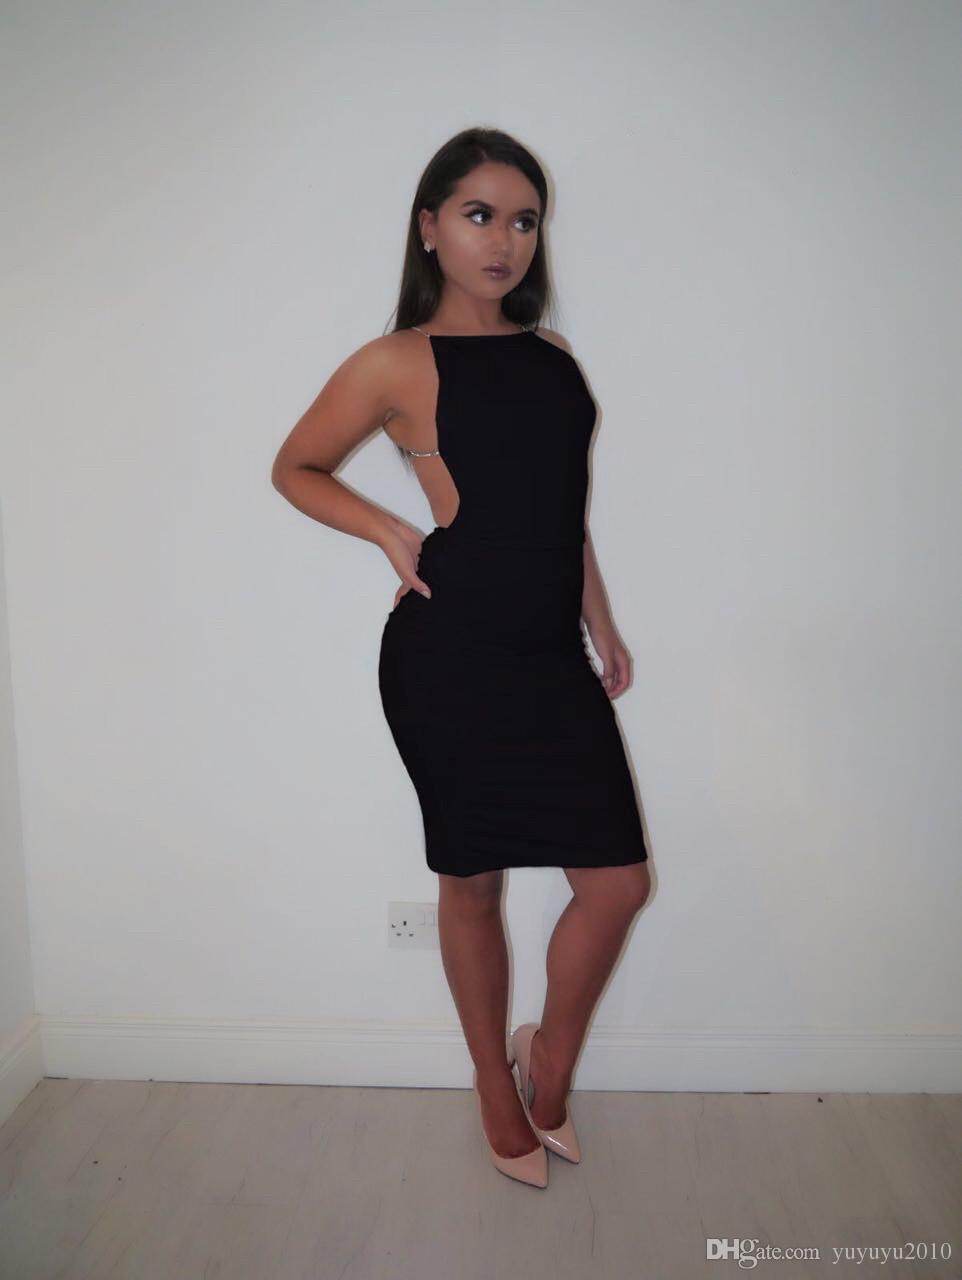 Robes de club sexy pour femmes Black White Backless Night Club Party Dress Back Strap Bodycon Dress Wrap Bandage Dress pour les femmes